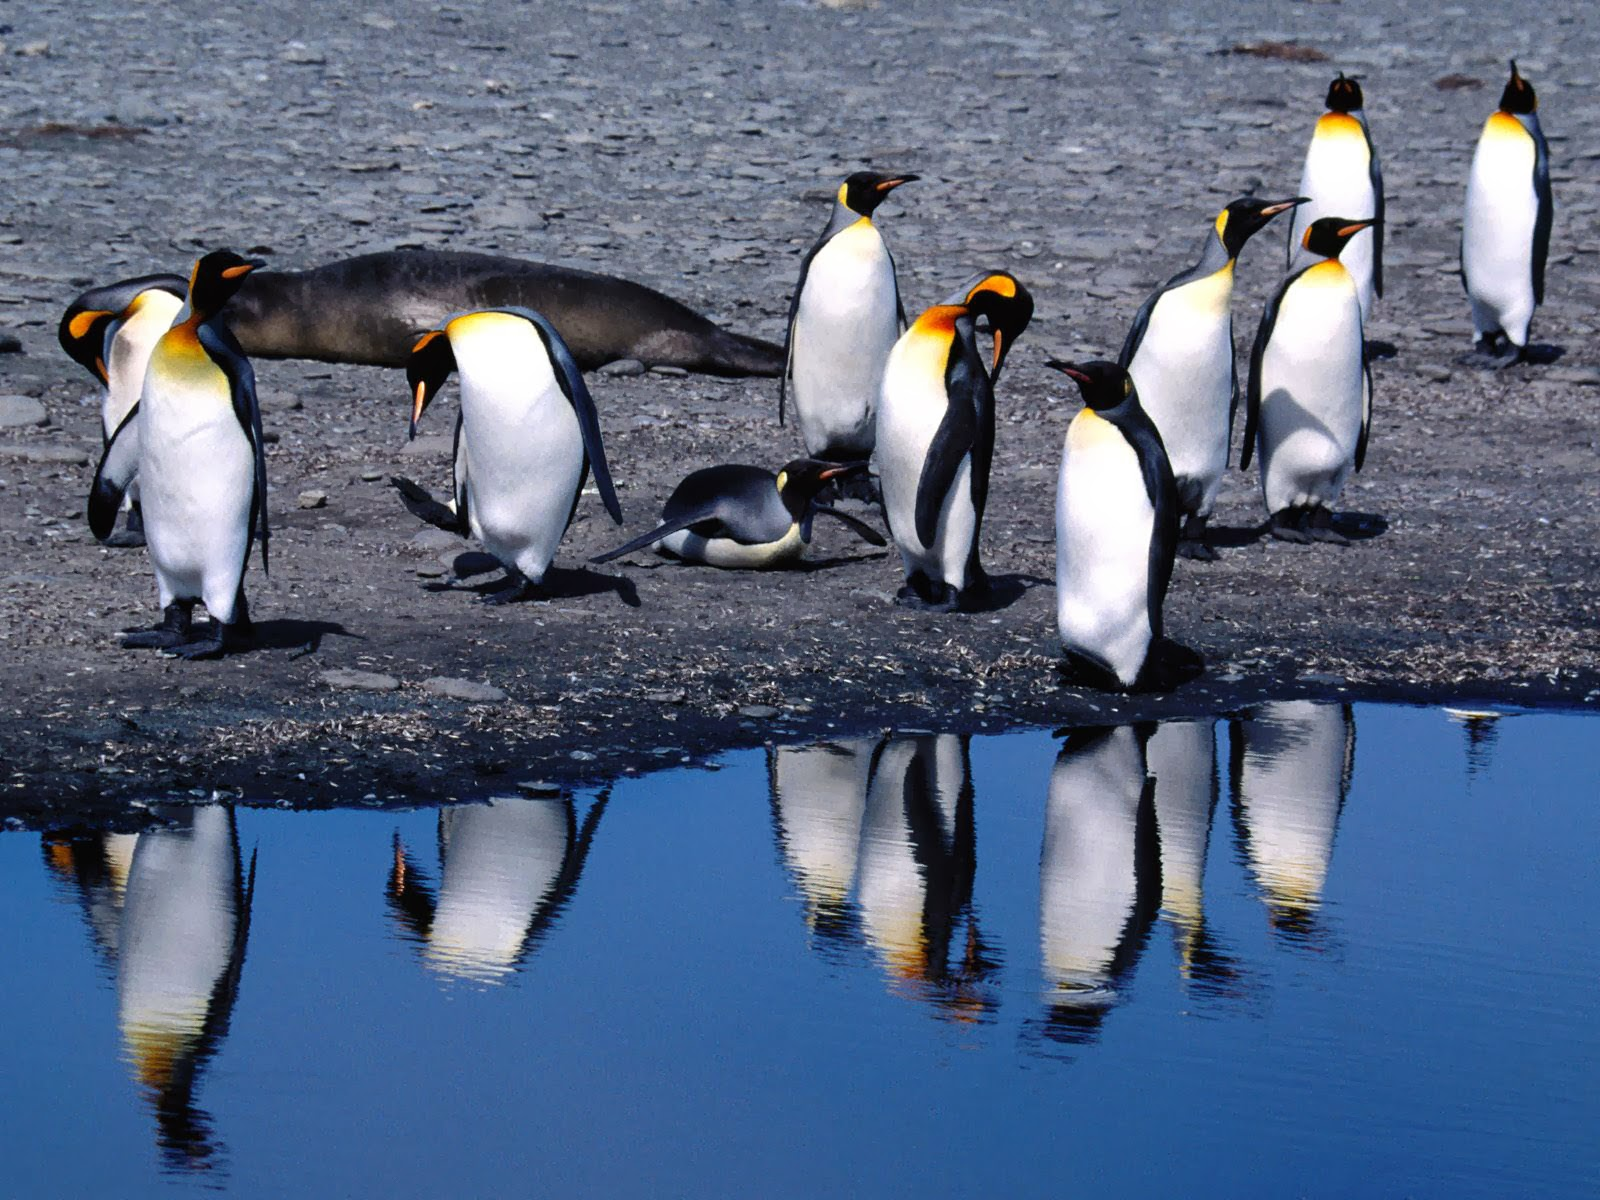 penguin wallpaper wallpapers - photo #38